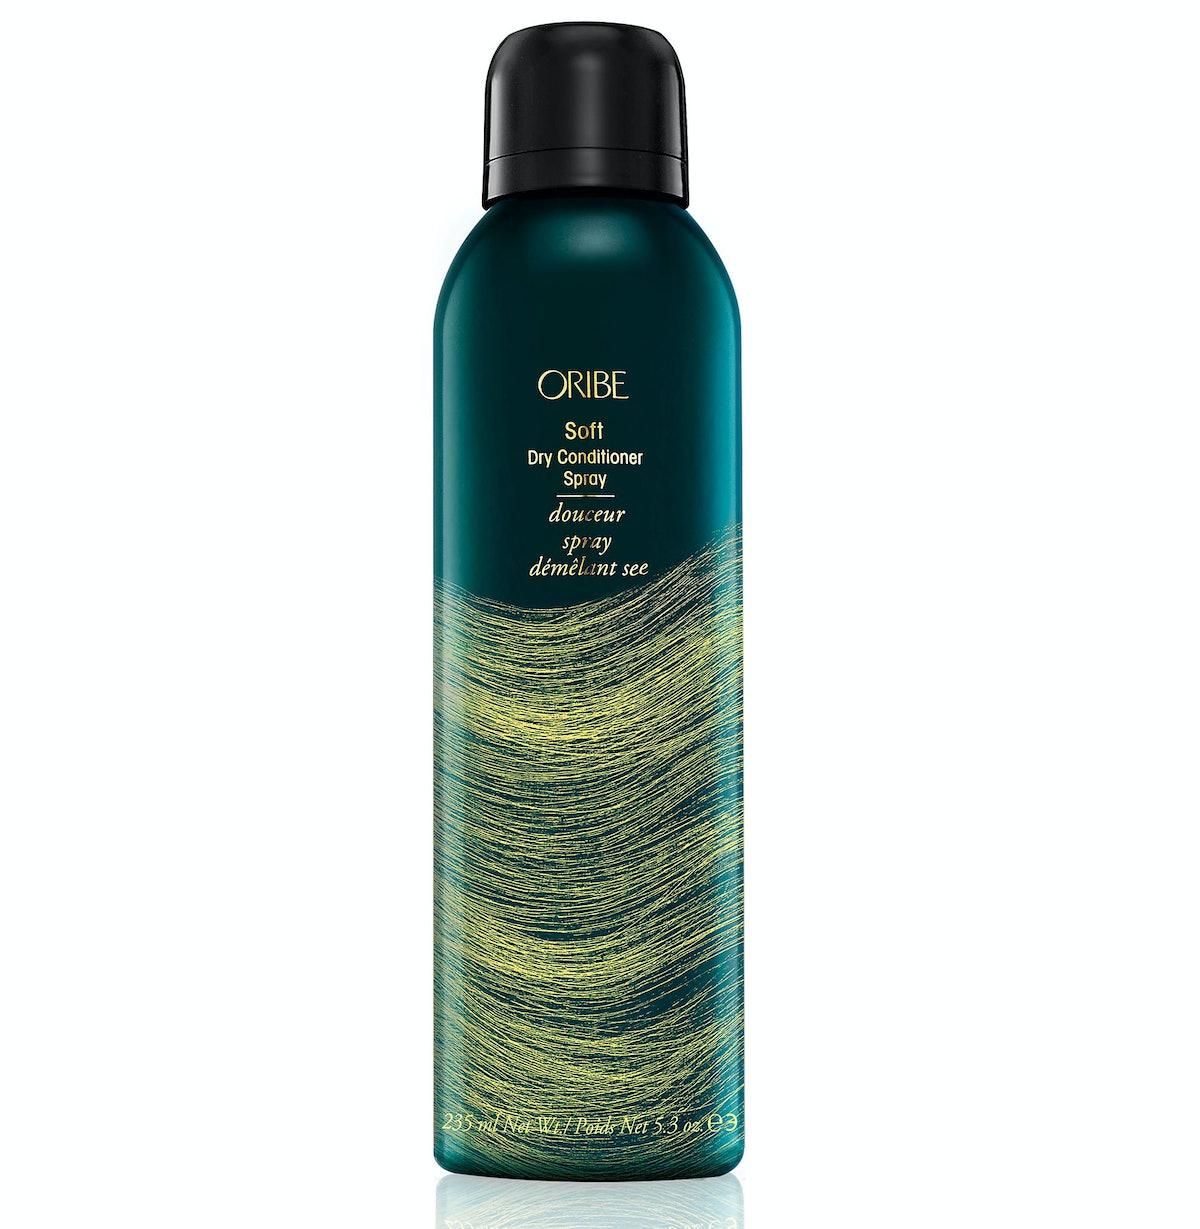 Oribe Soft Dry Conditioner Spray